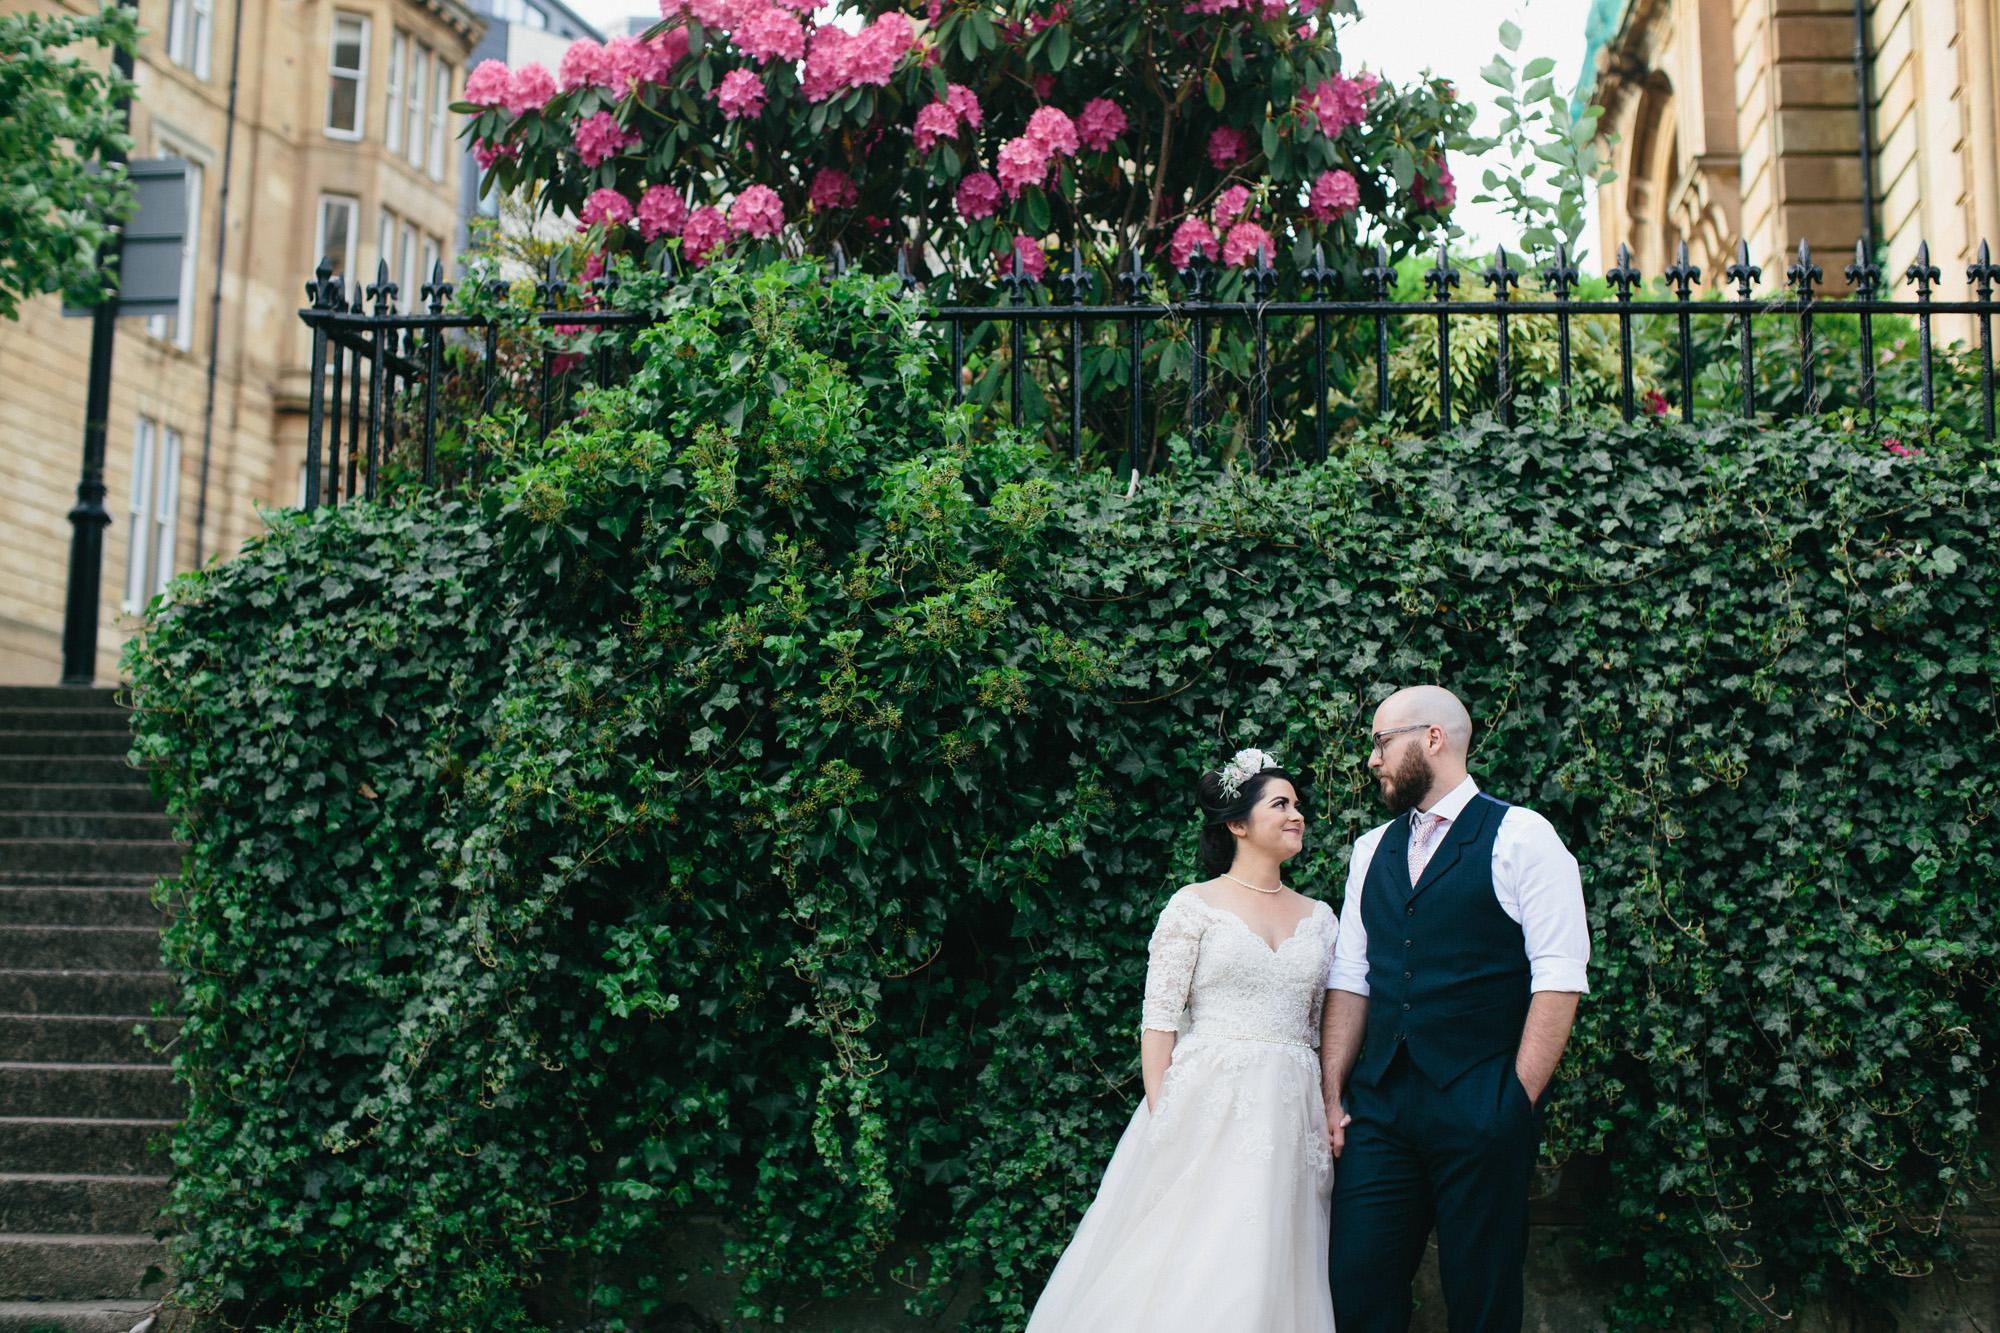 Quirky Wedding Photography Glasgow West End 058.jpg